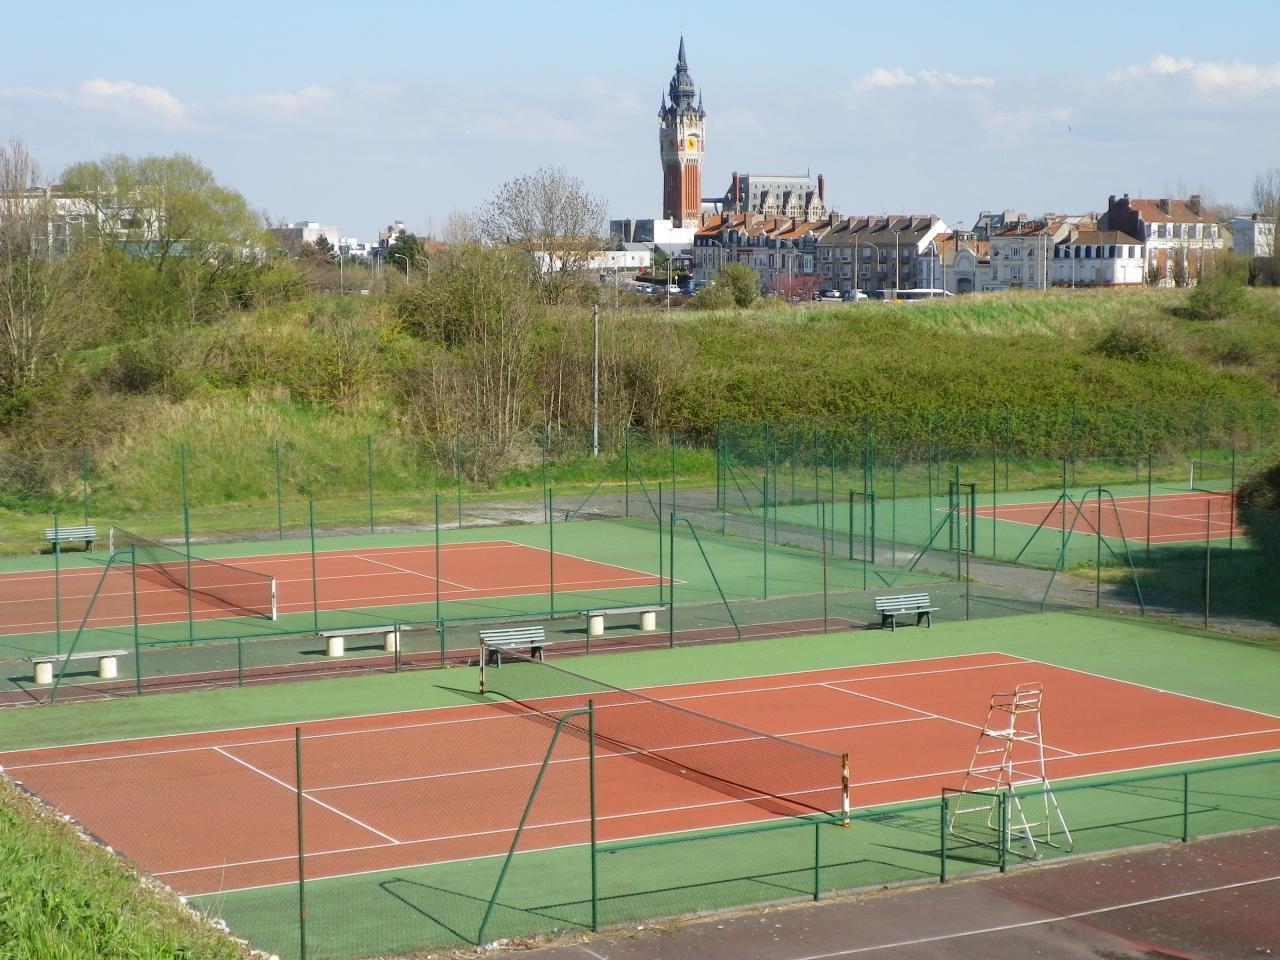 Ses tennis